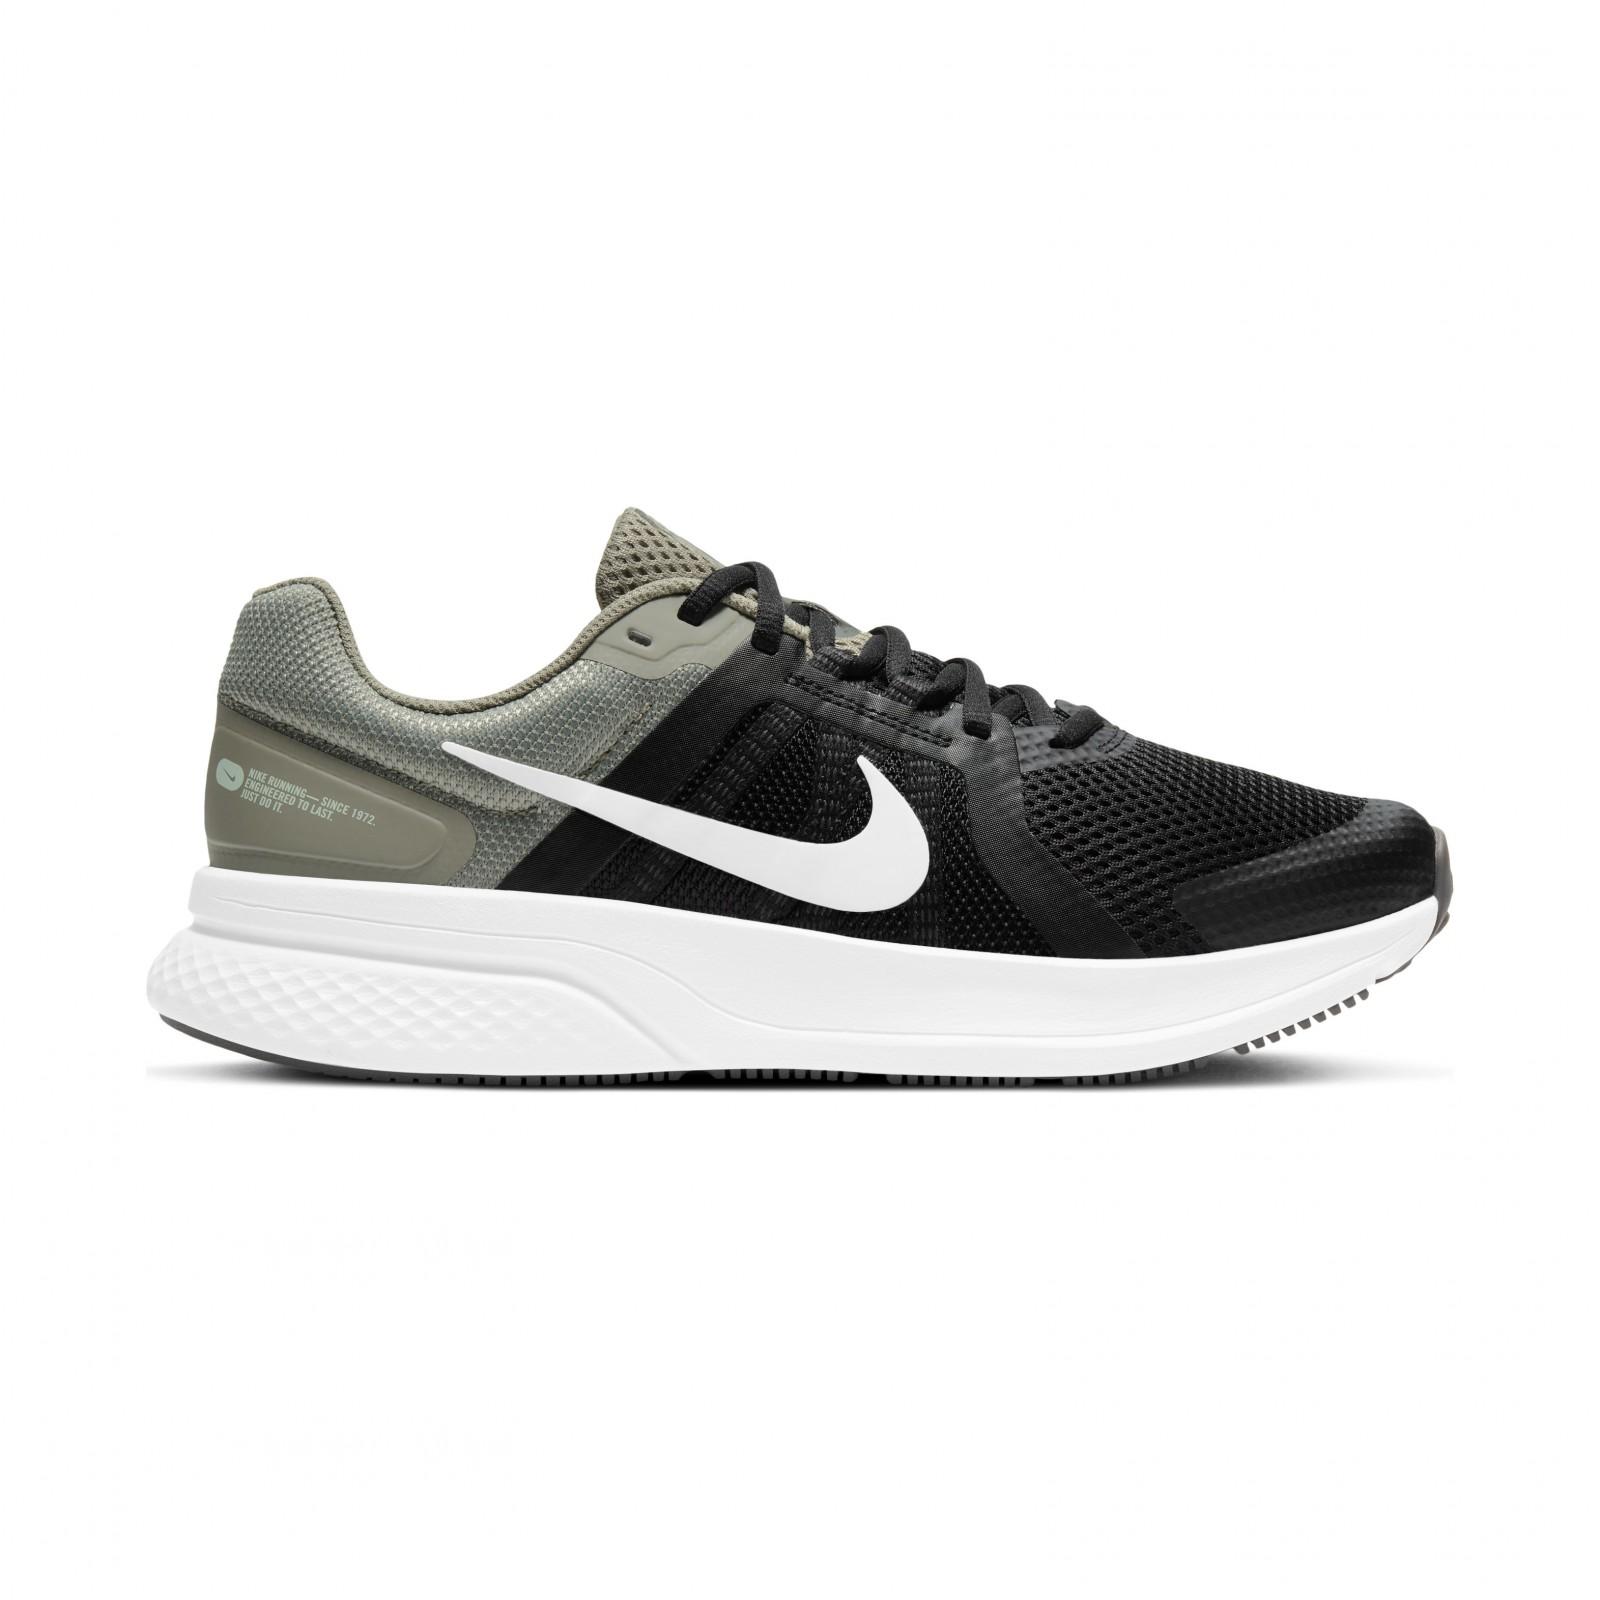 Nike Run Swift 2 LIGHT ARMY/PURE PLATINUM-BLACK